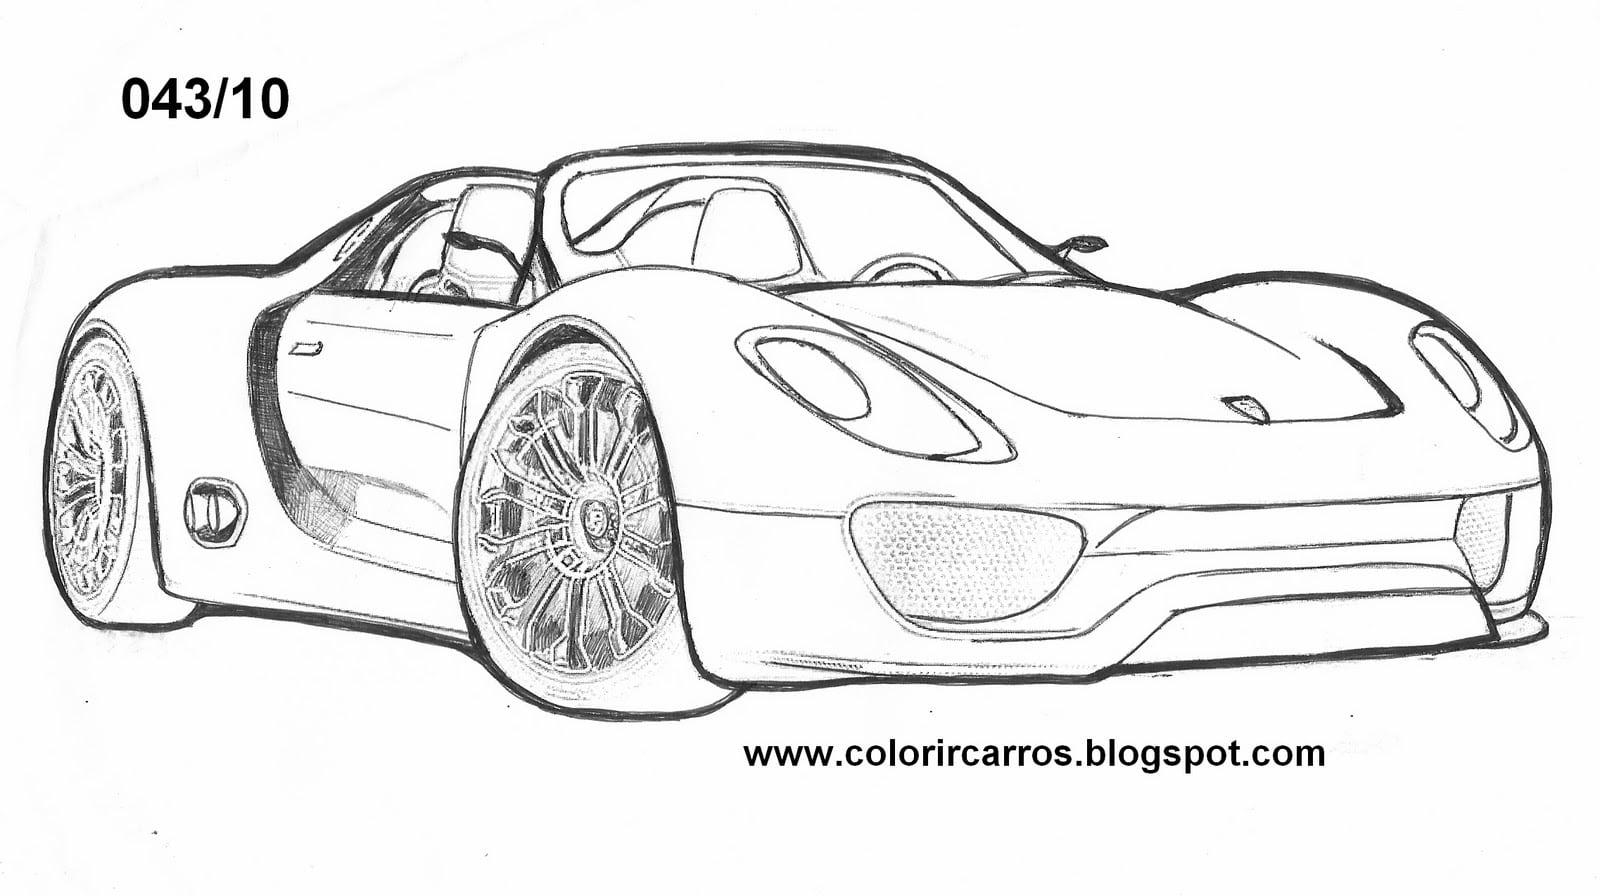 Colorindo E Desenhando  Carro Para Colorir  5